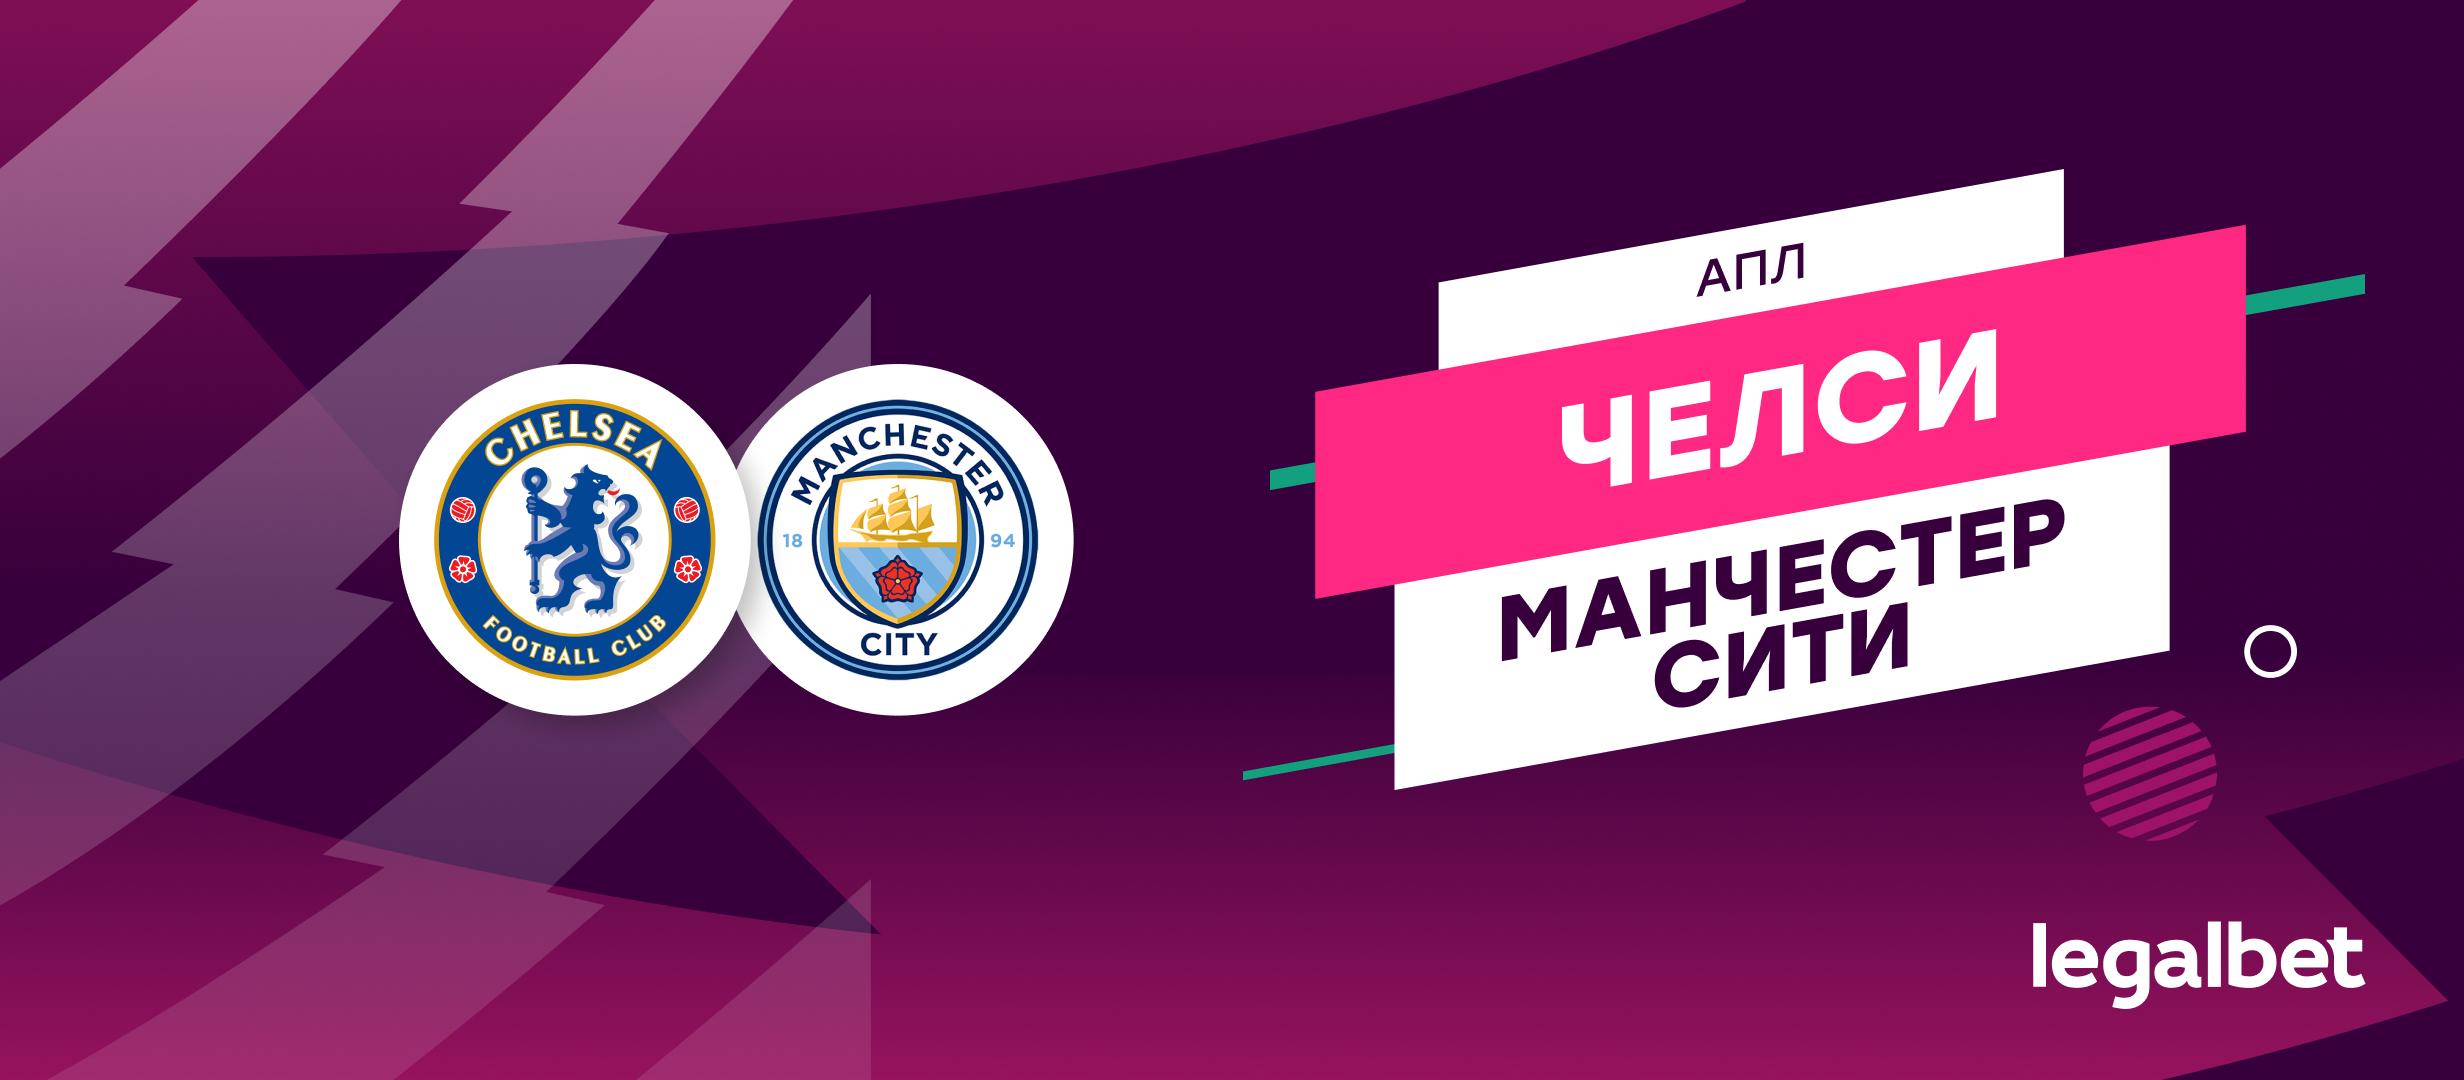 «Челси» — «Манчестер Сити»: ставки и коэффициенты на матч